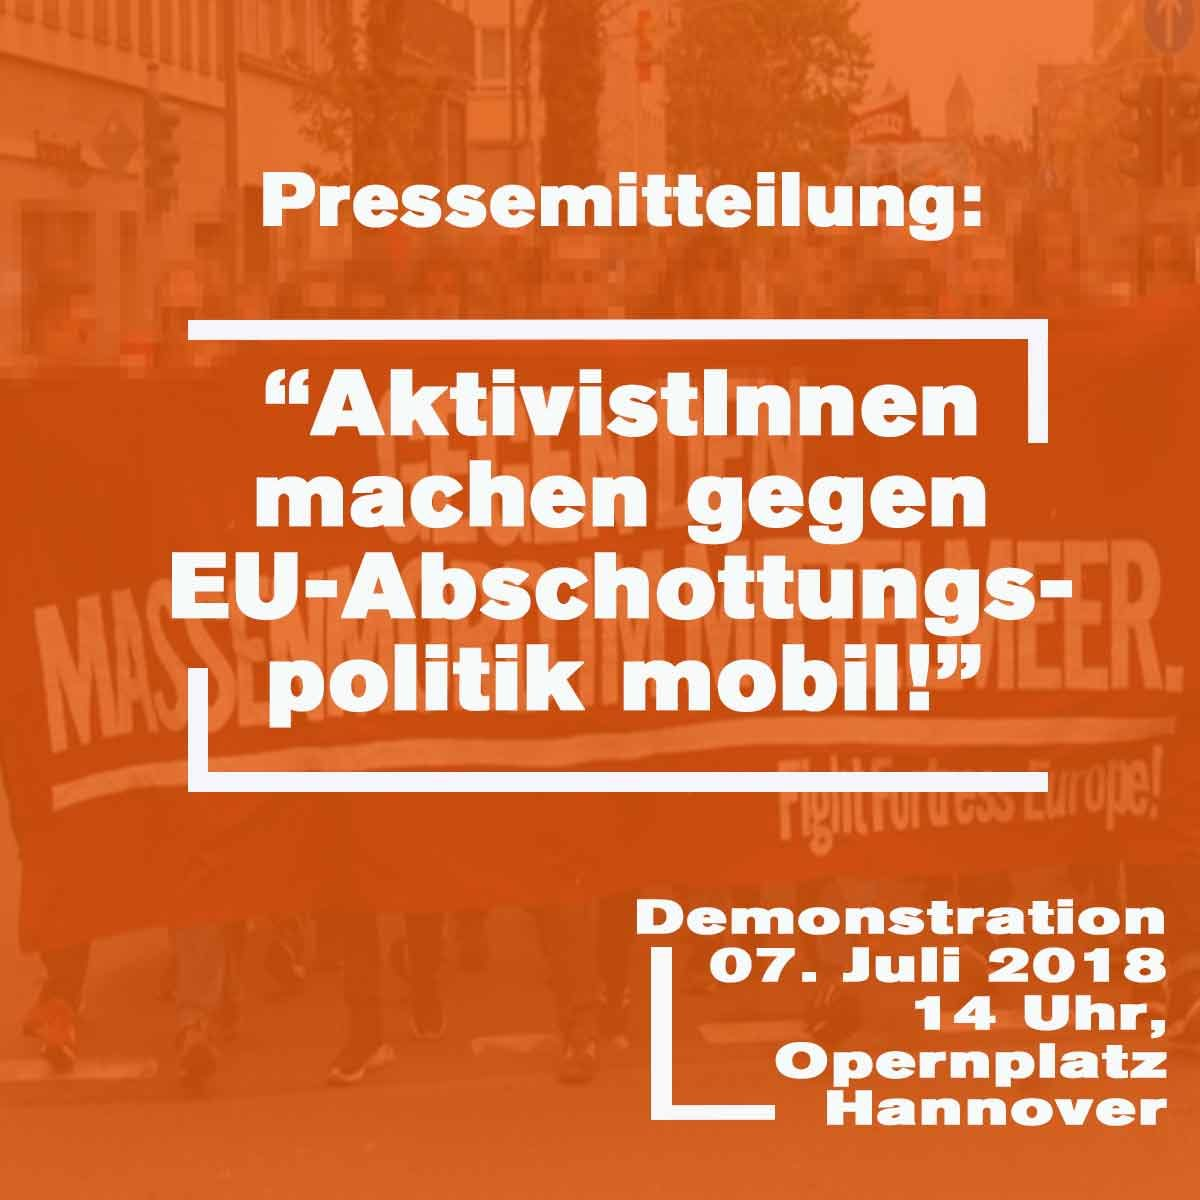 Presse: AktivistInnen machen gegen EU-Abschottungspolitik mobil